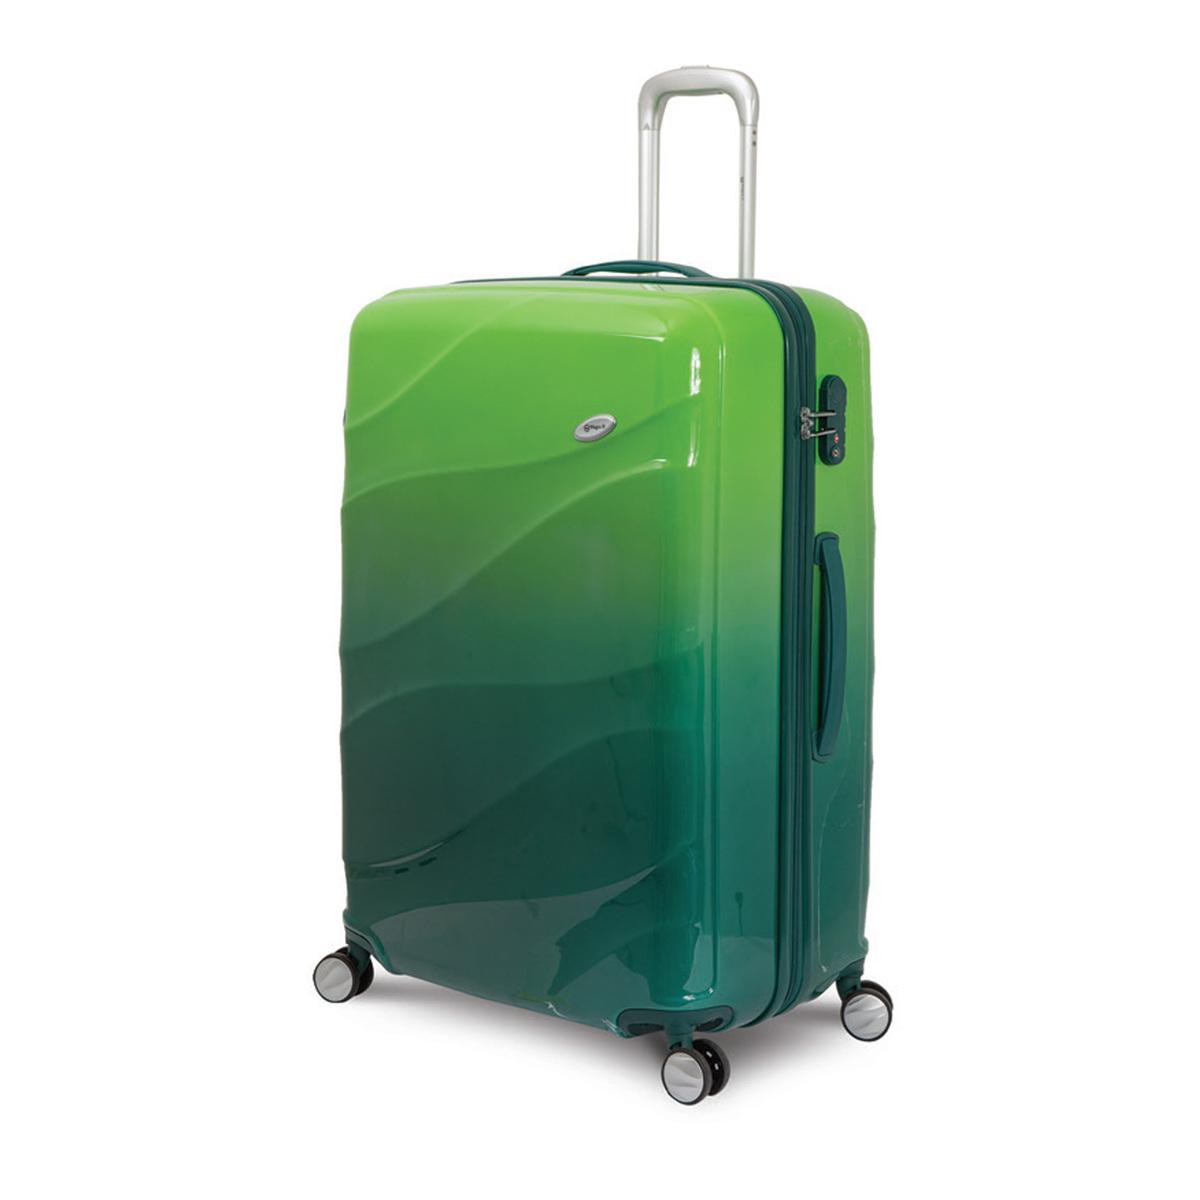 Buy Wagon R 4 Wheel Hard Trolley 24inch Assorted Color